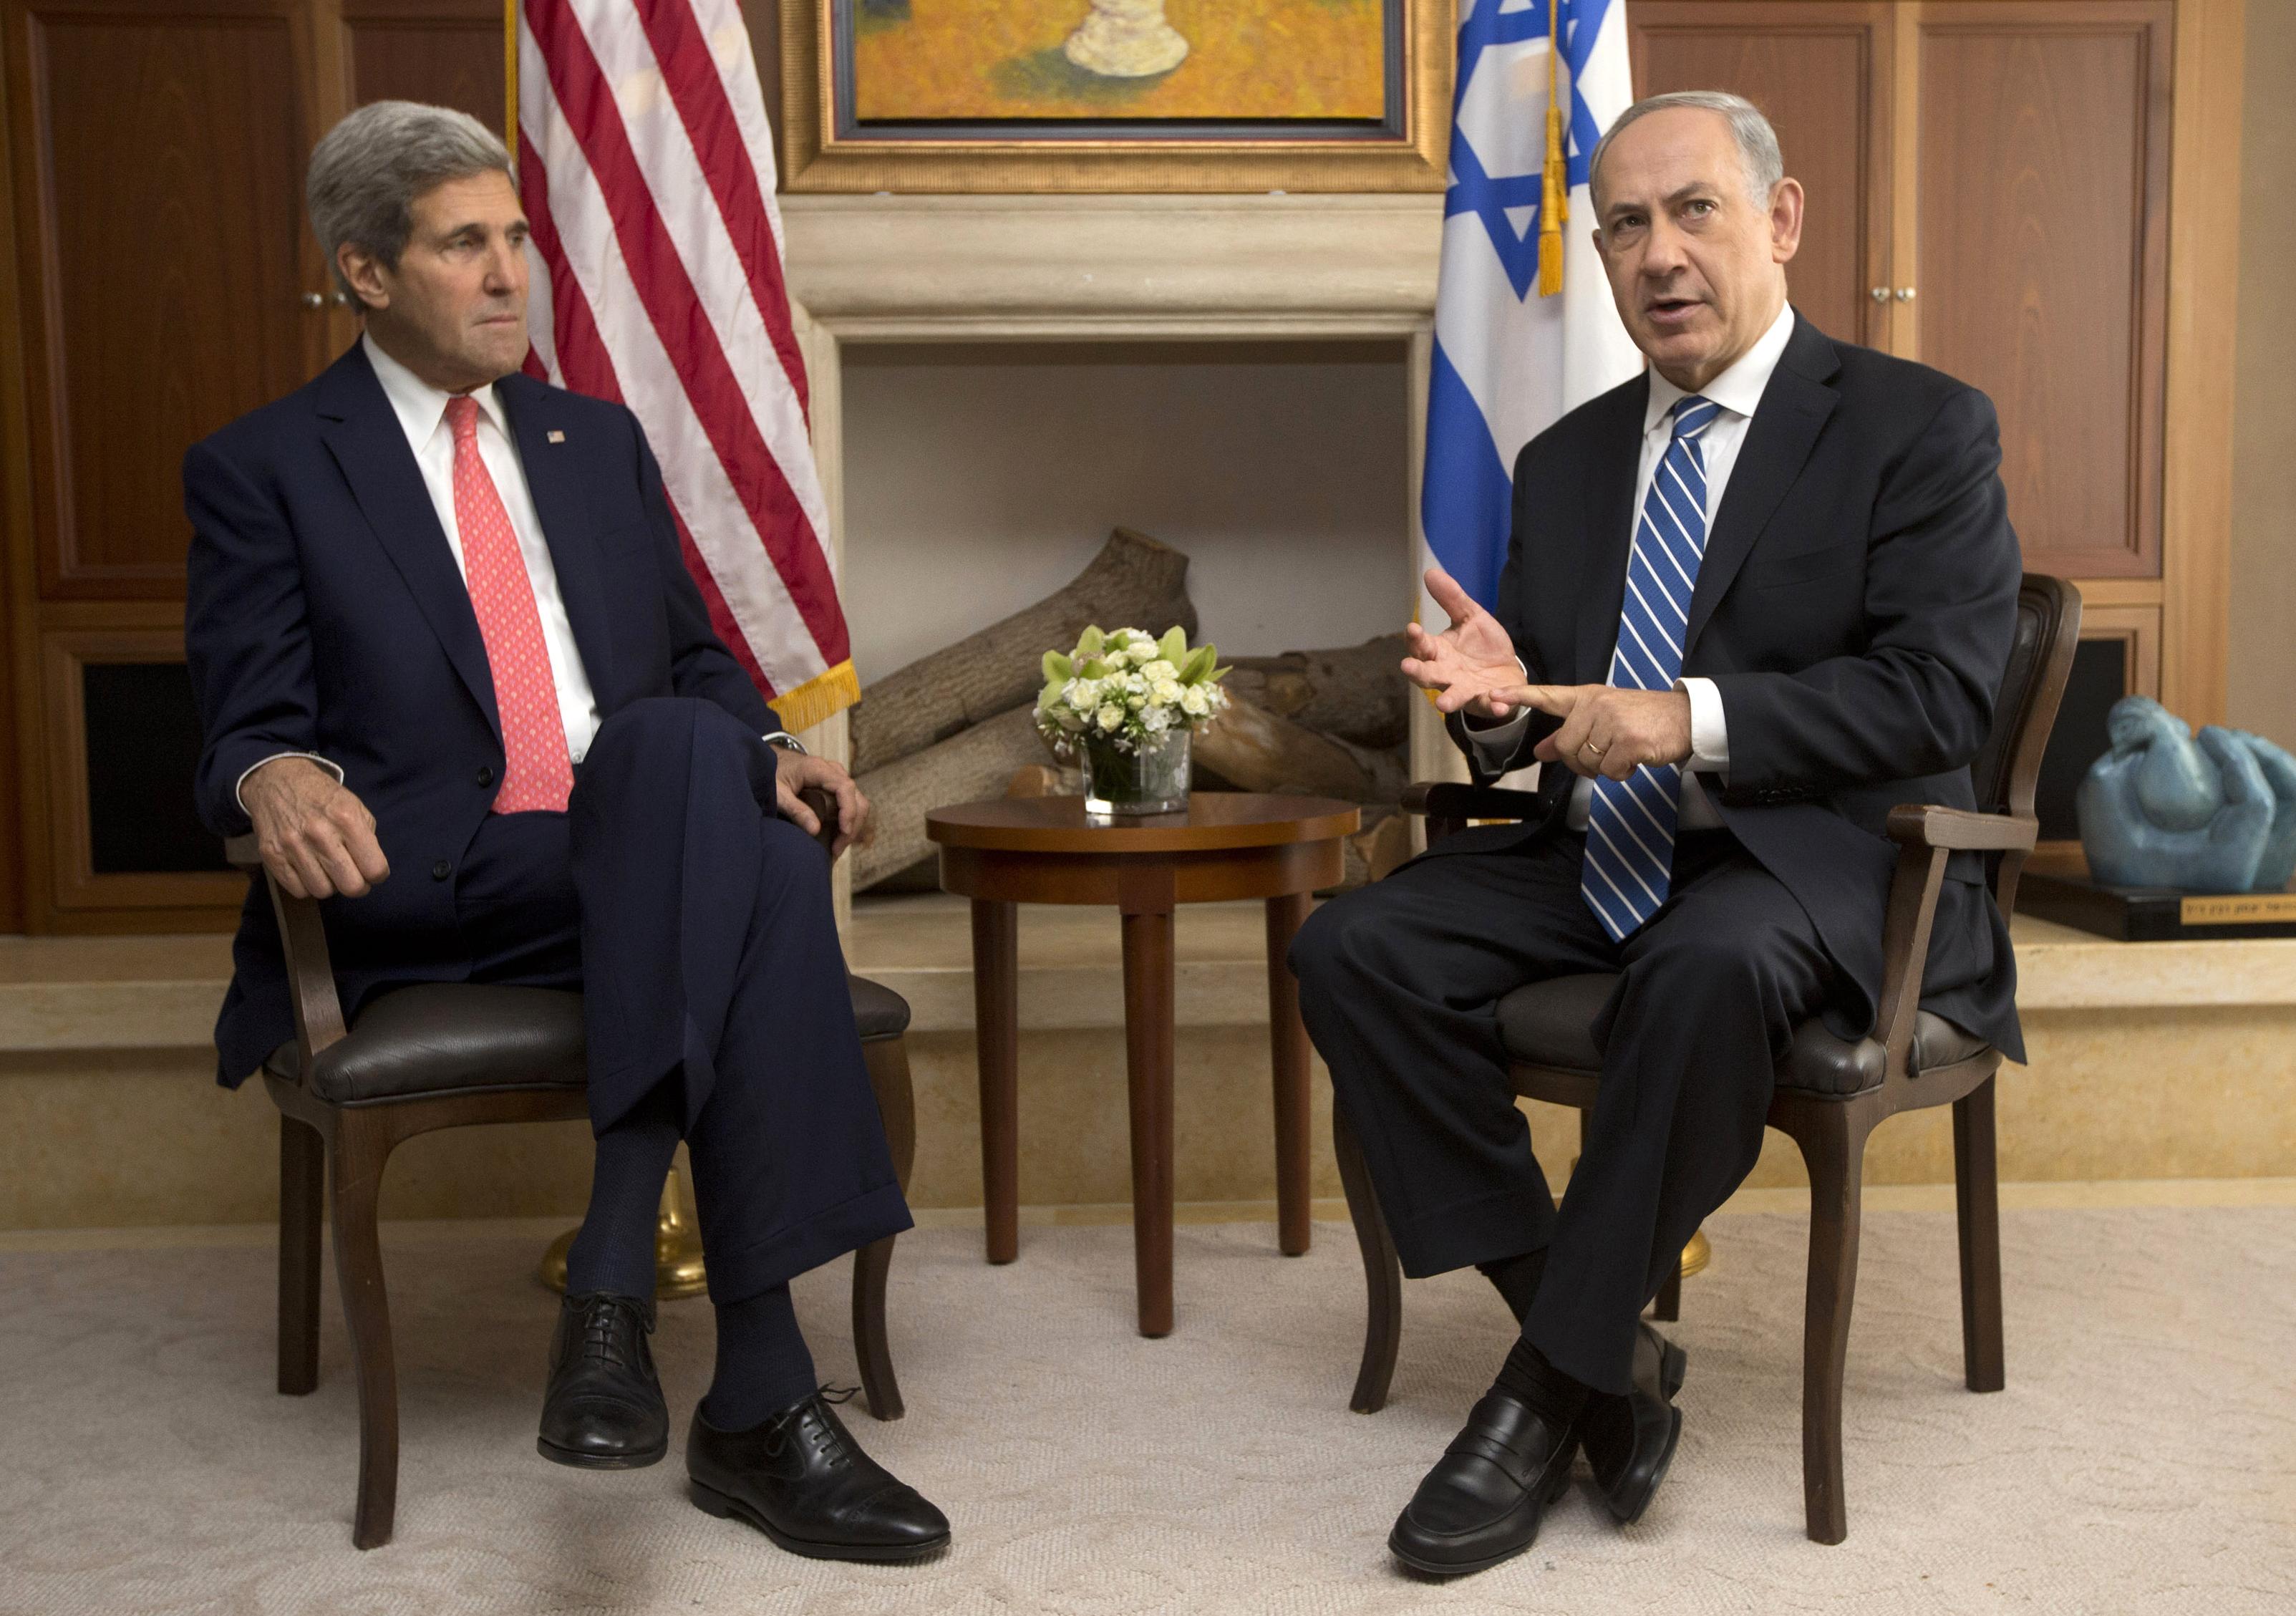 Israeli Prime Minister Benjamin Netanyahu speaks with US Secretary of State John Kerry during a meeting on 6 November in Jerusalem. (JASON REED/AFP/Getty Images)